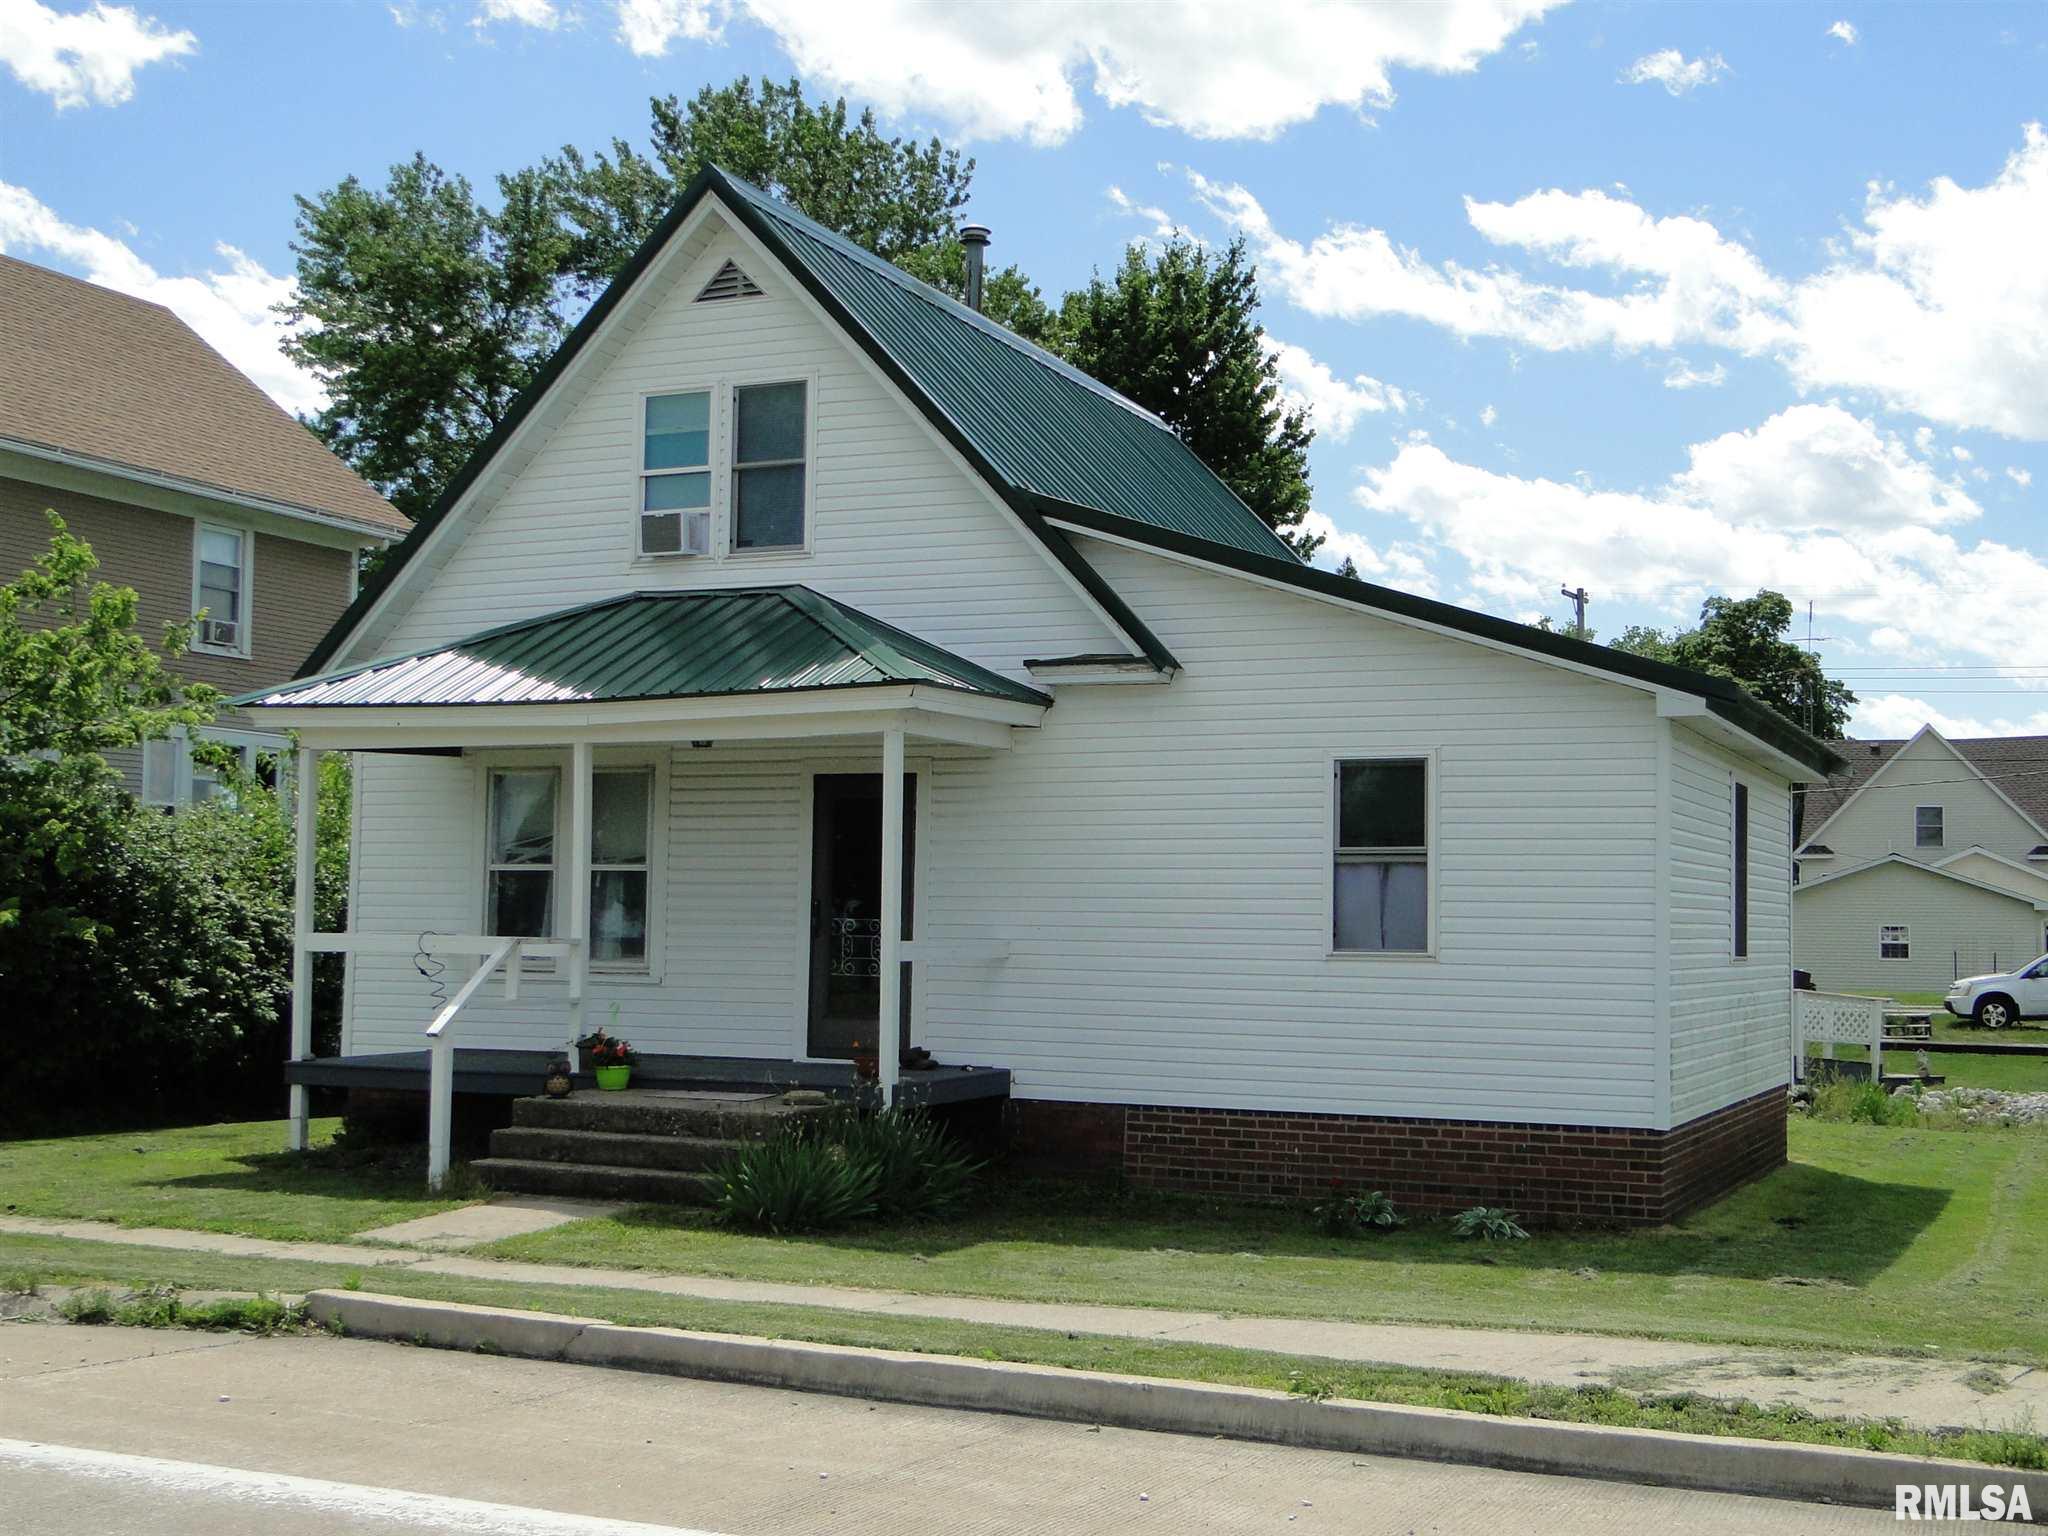 427 W MAIN Property Photo - Adair, IL real estate listing